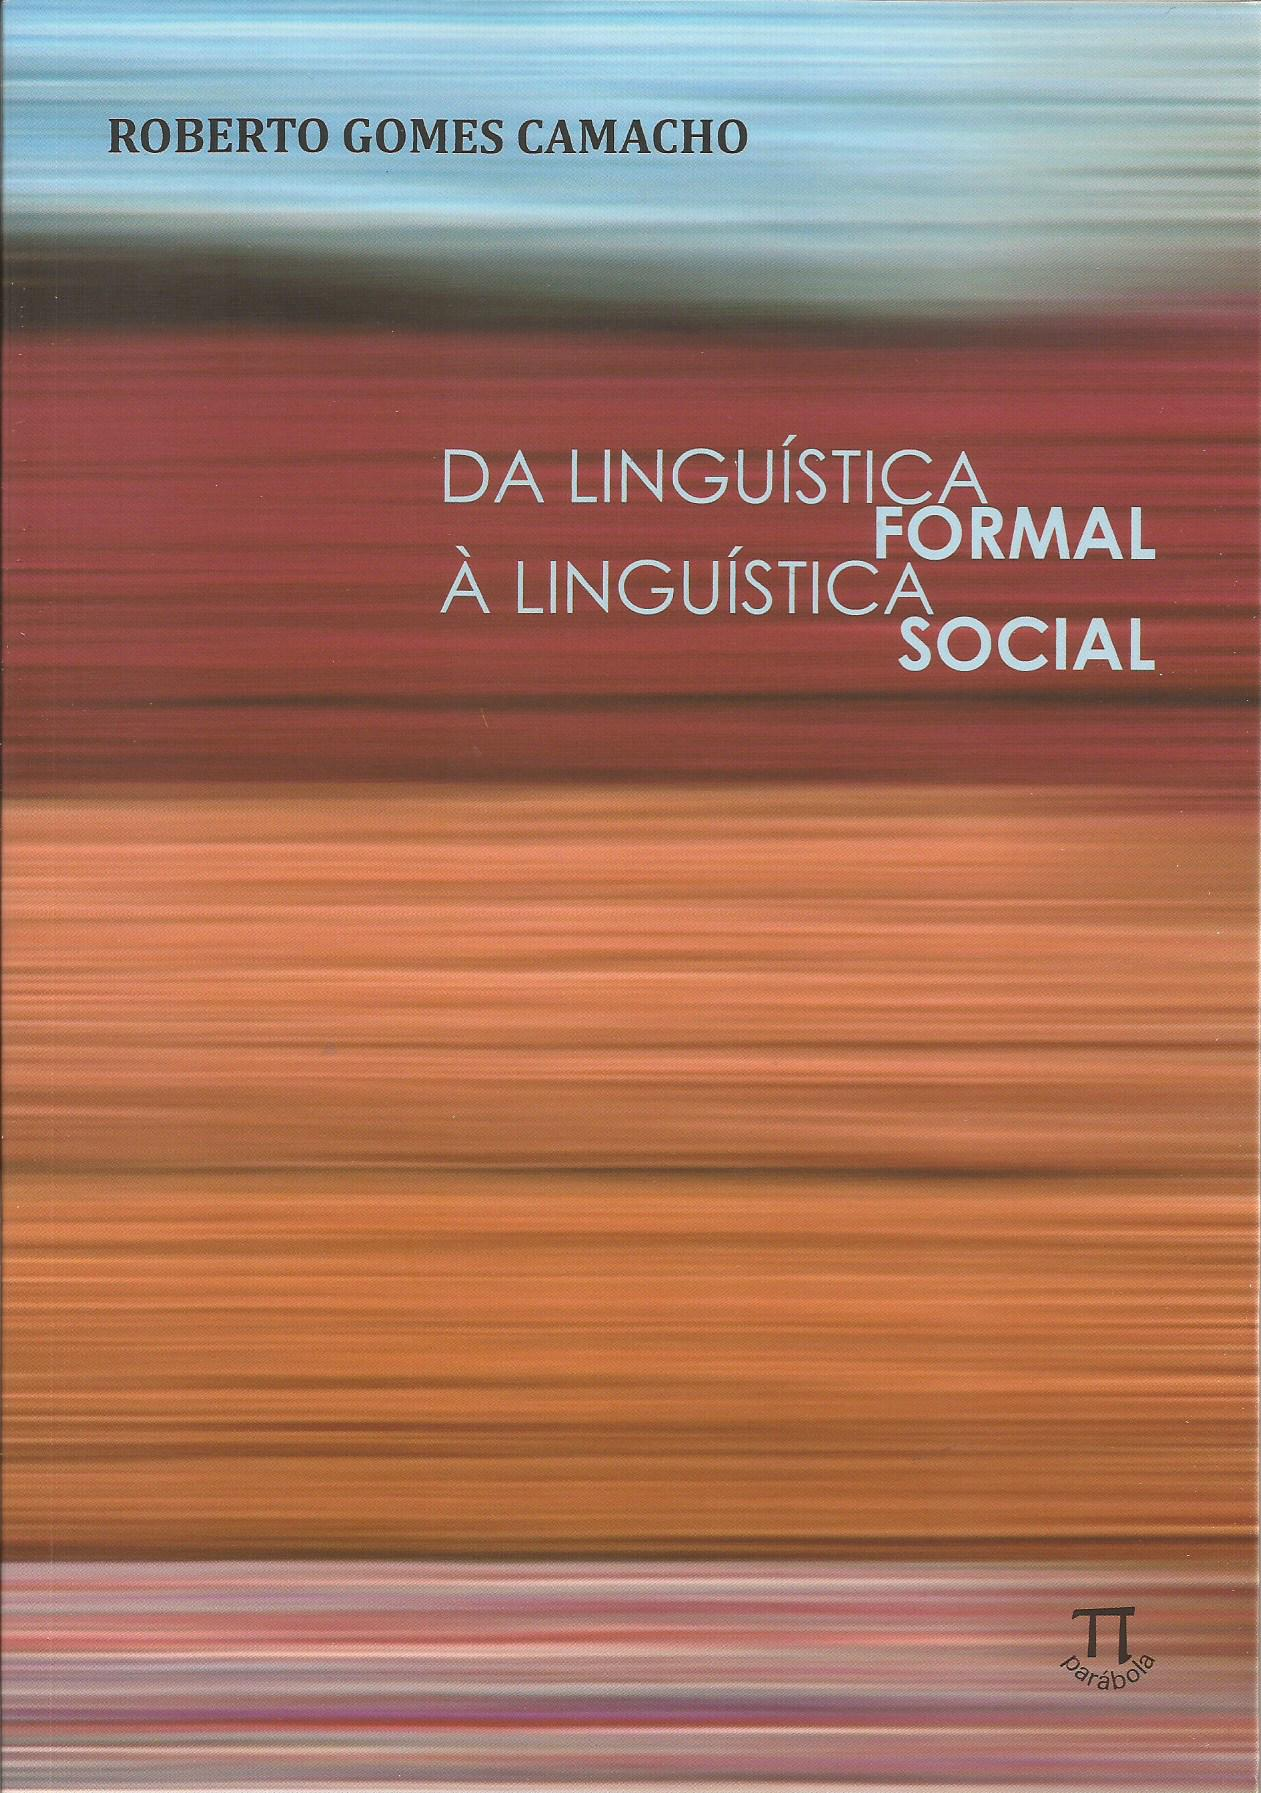 Da linguística formal à linguística social